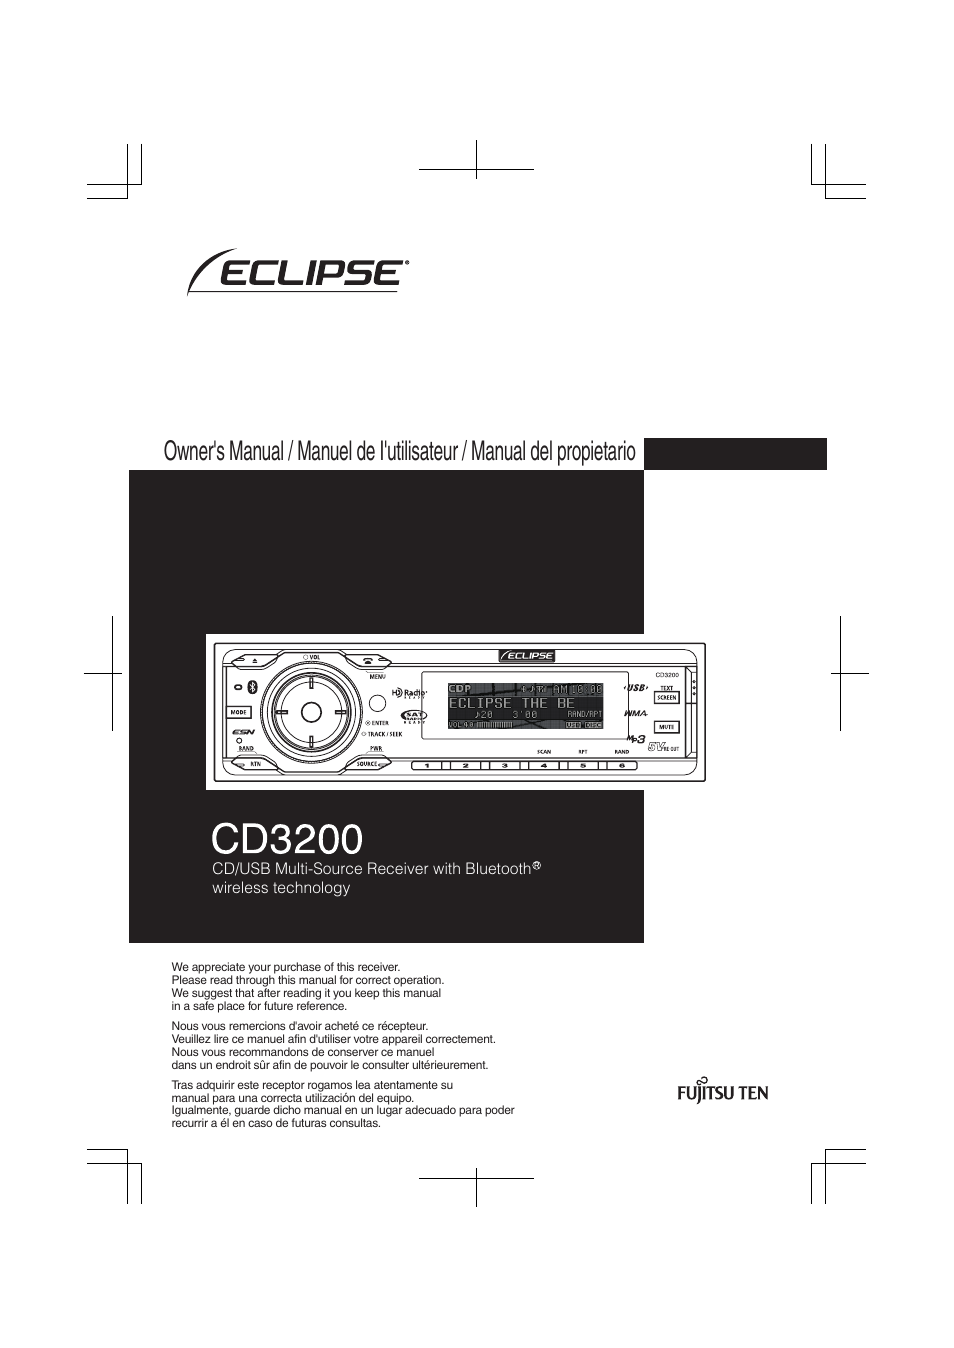 eclipse fujitsu ten eclipse cd3200 user manual 111 pages rh manualsdir com